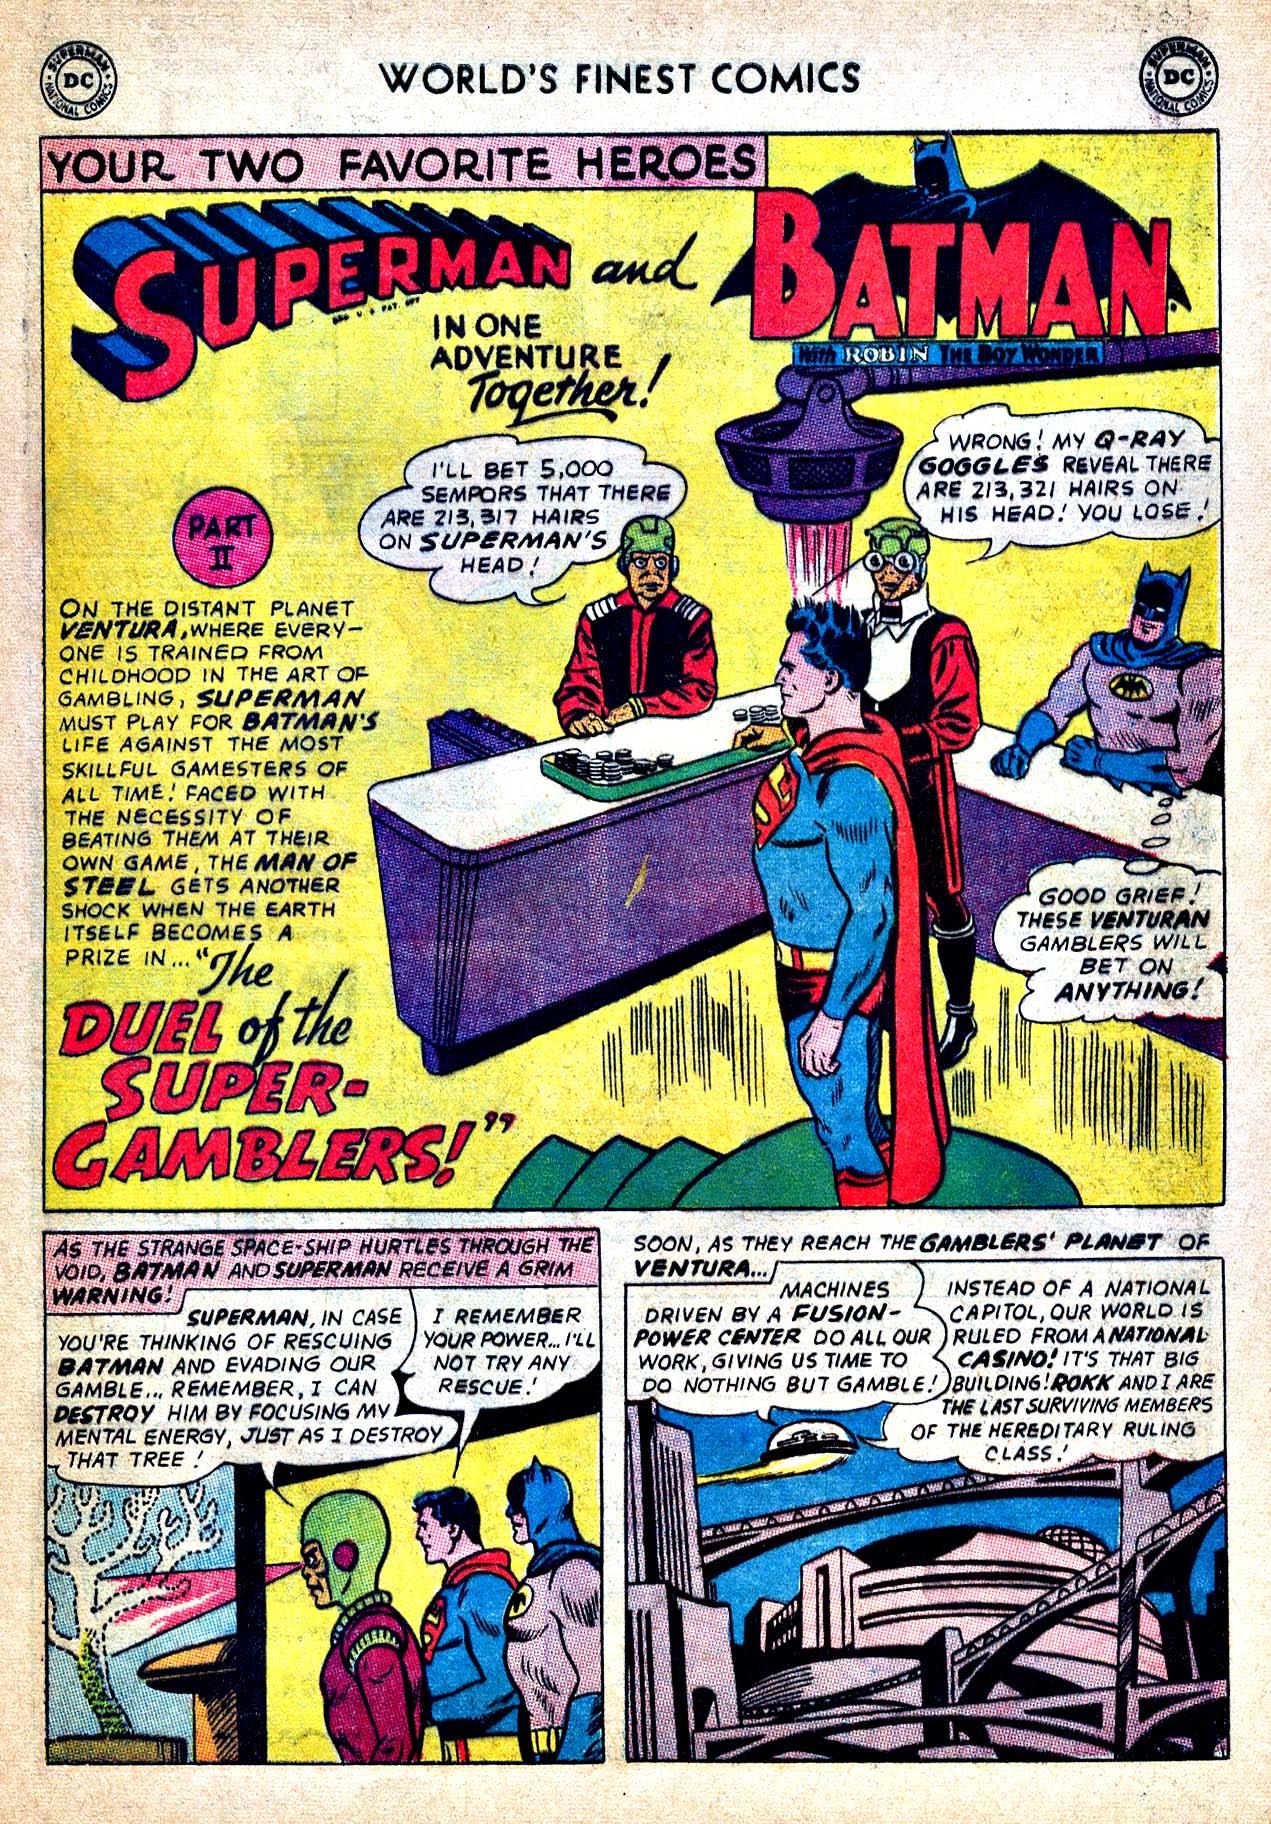 Read online World's Finest Comics comic -  Issue #150 - 13